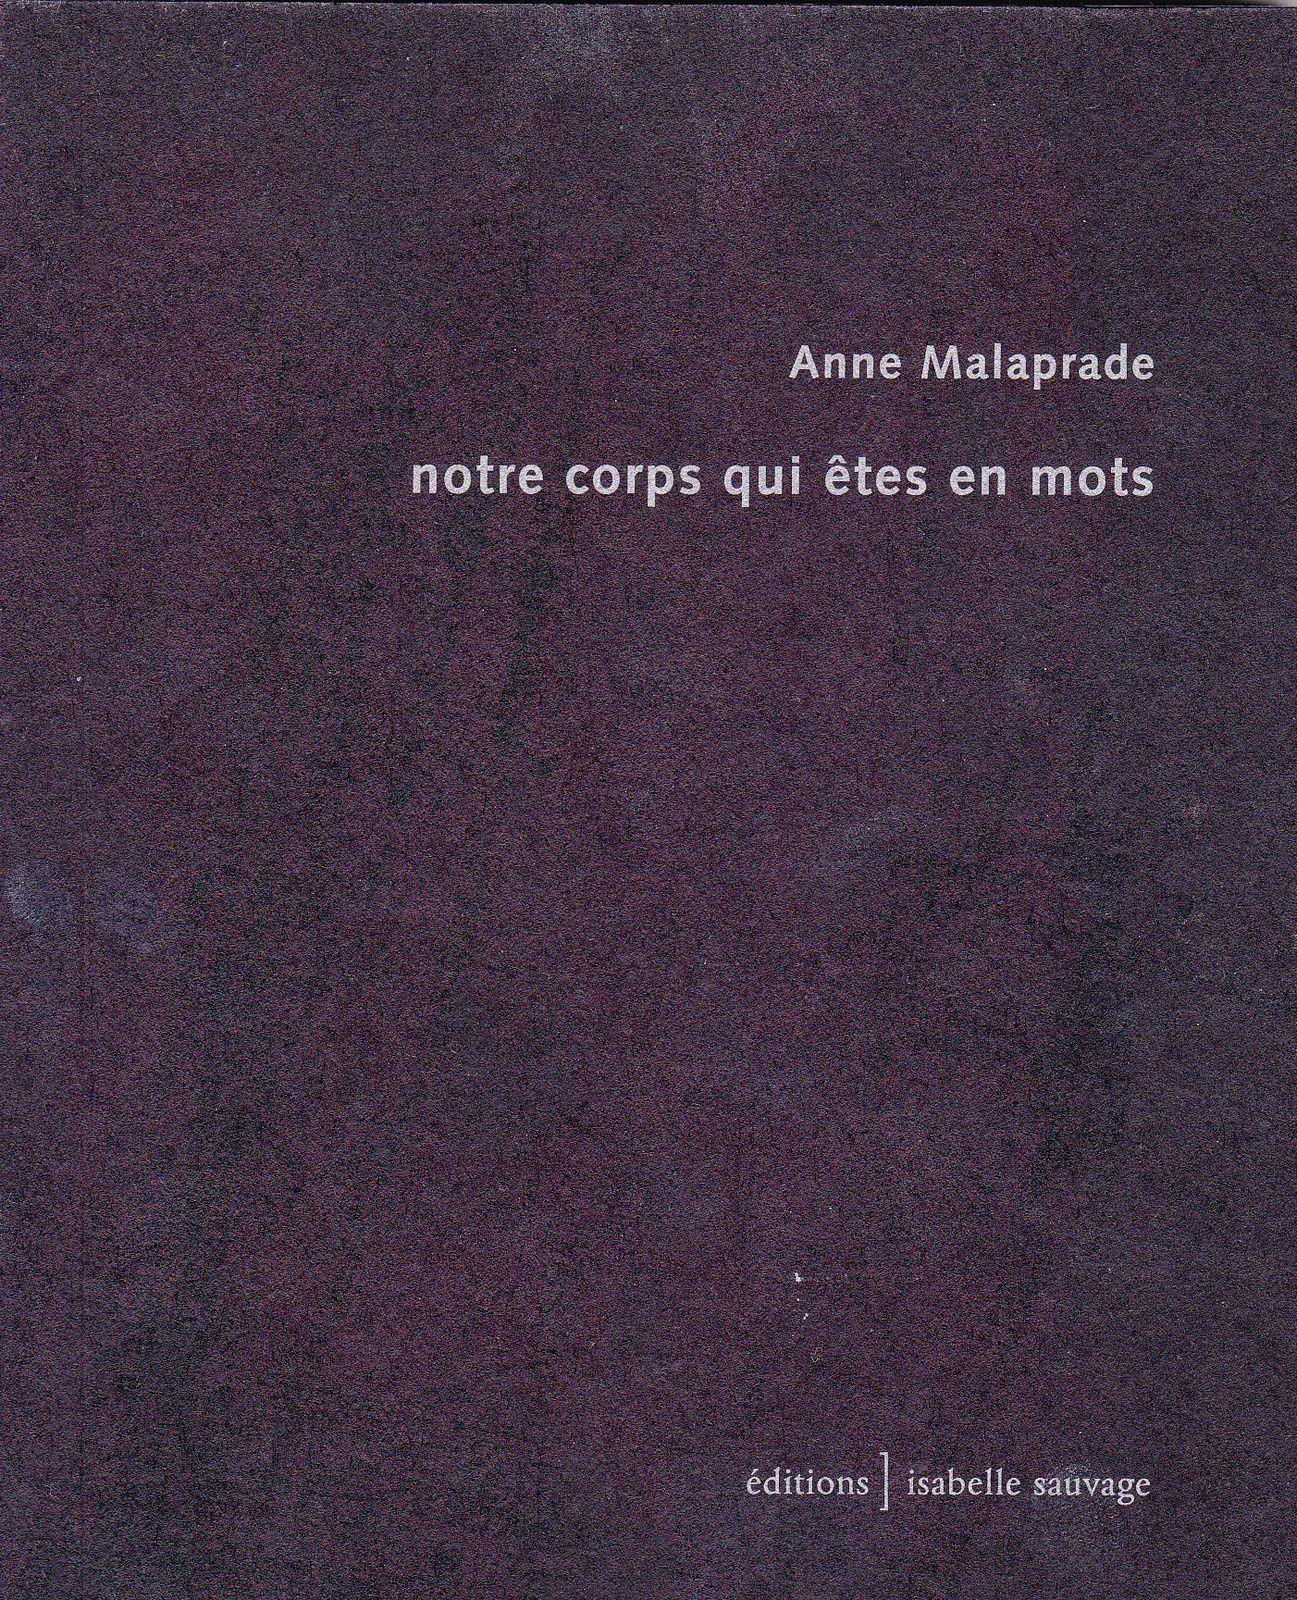 Imitation - Anne Malaprade